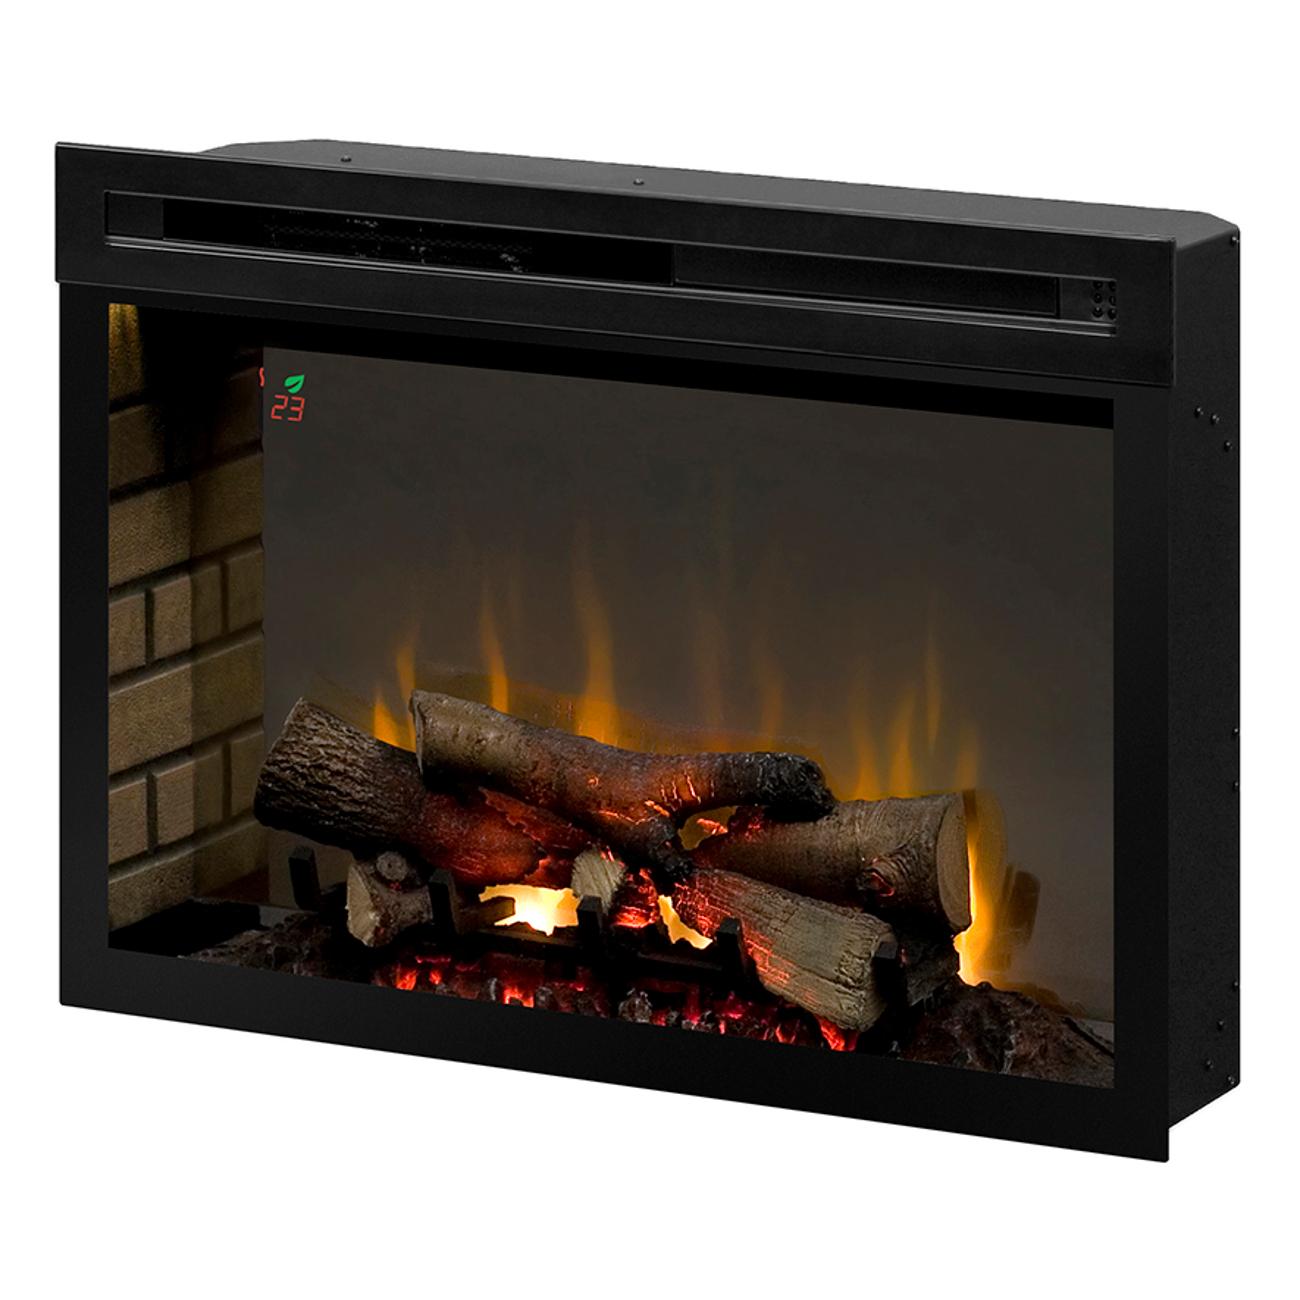 dimplex-33-inch-multifire-electric-fireplace-insert-PF3033HL